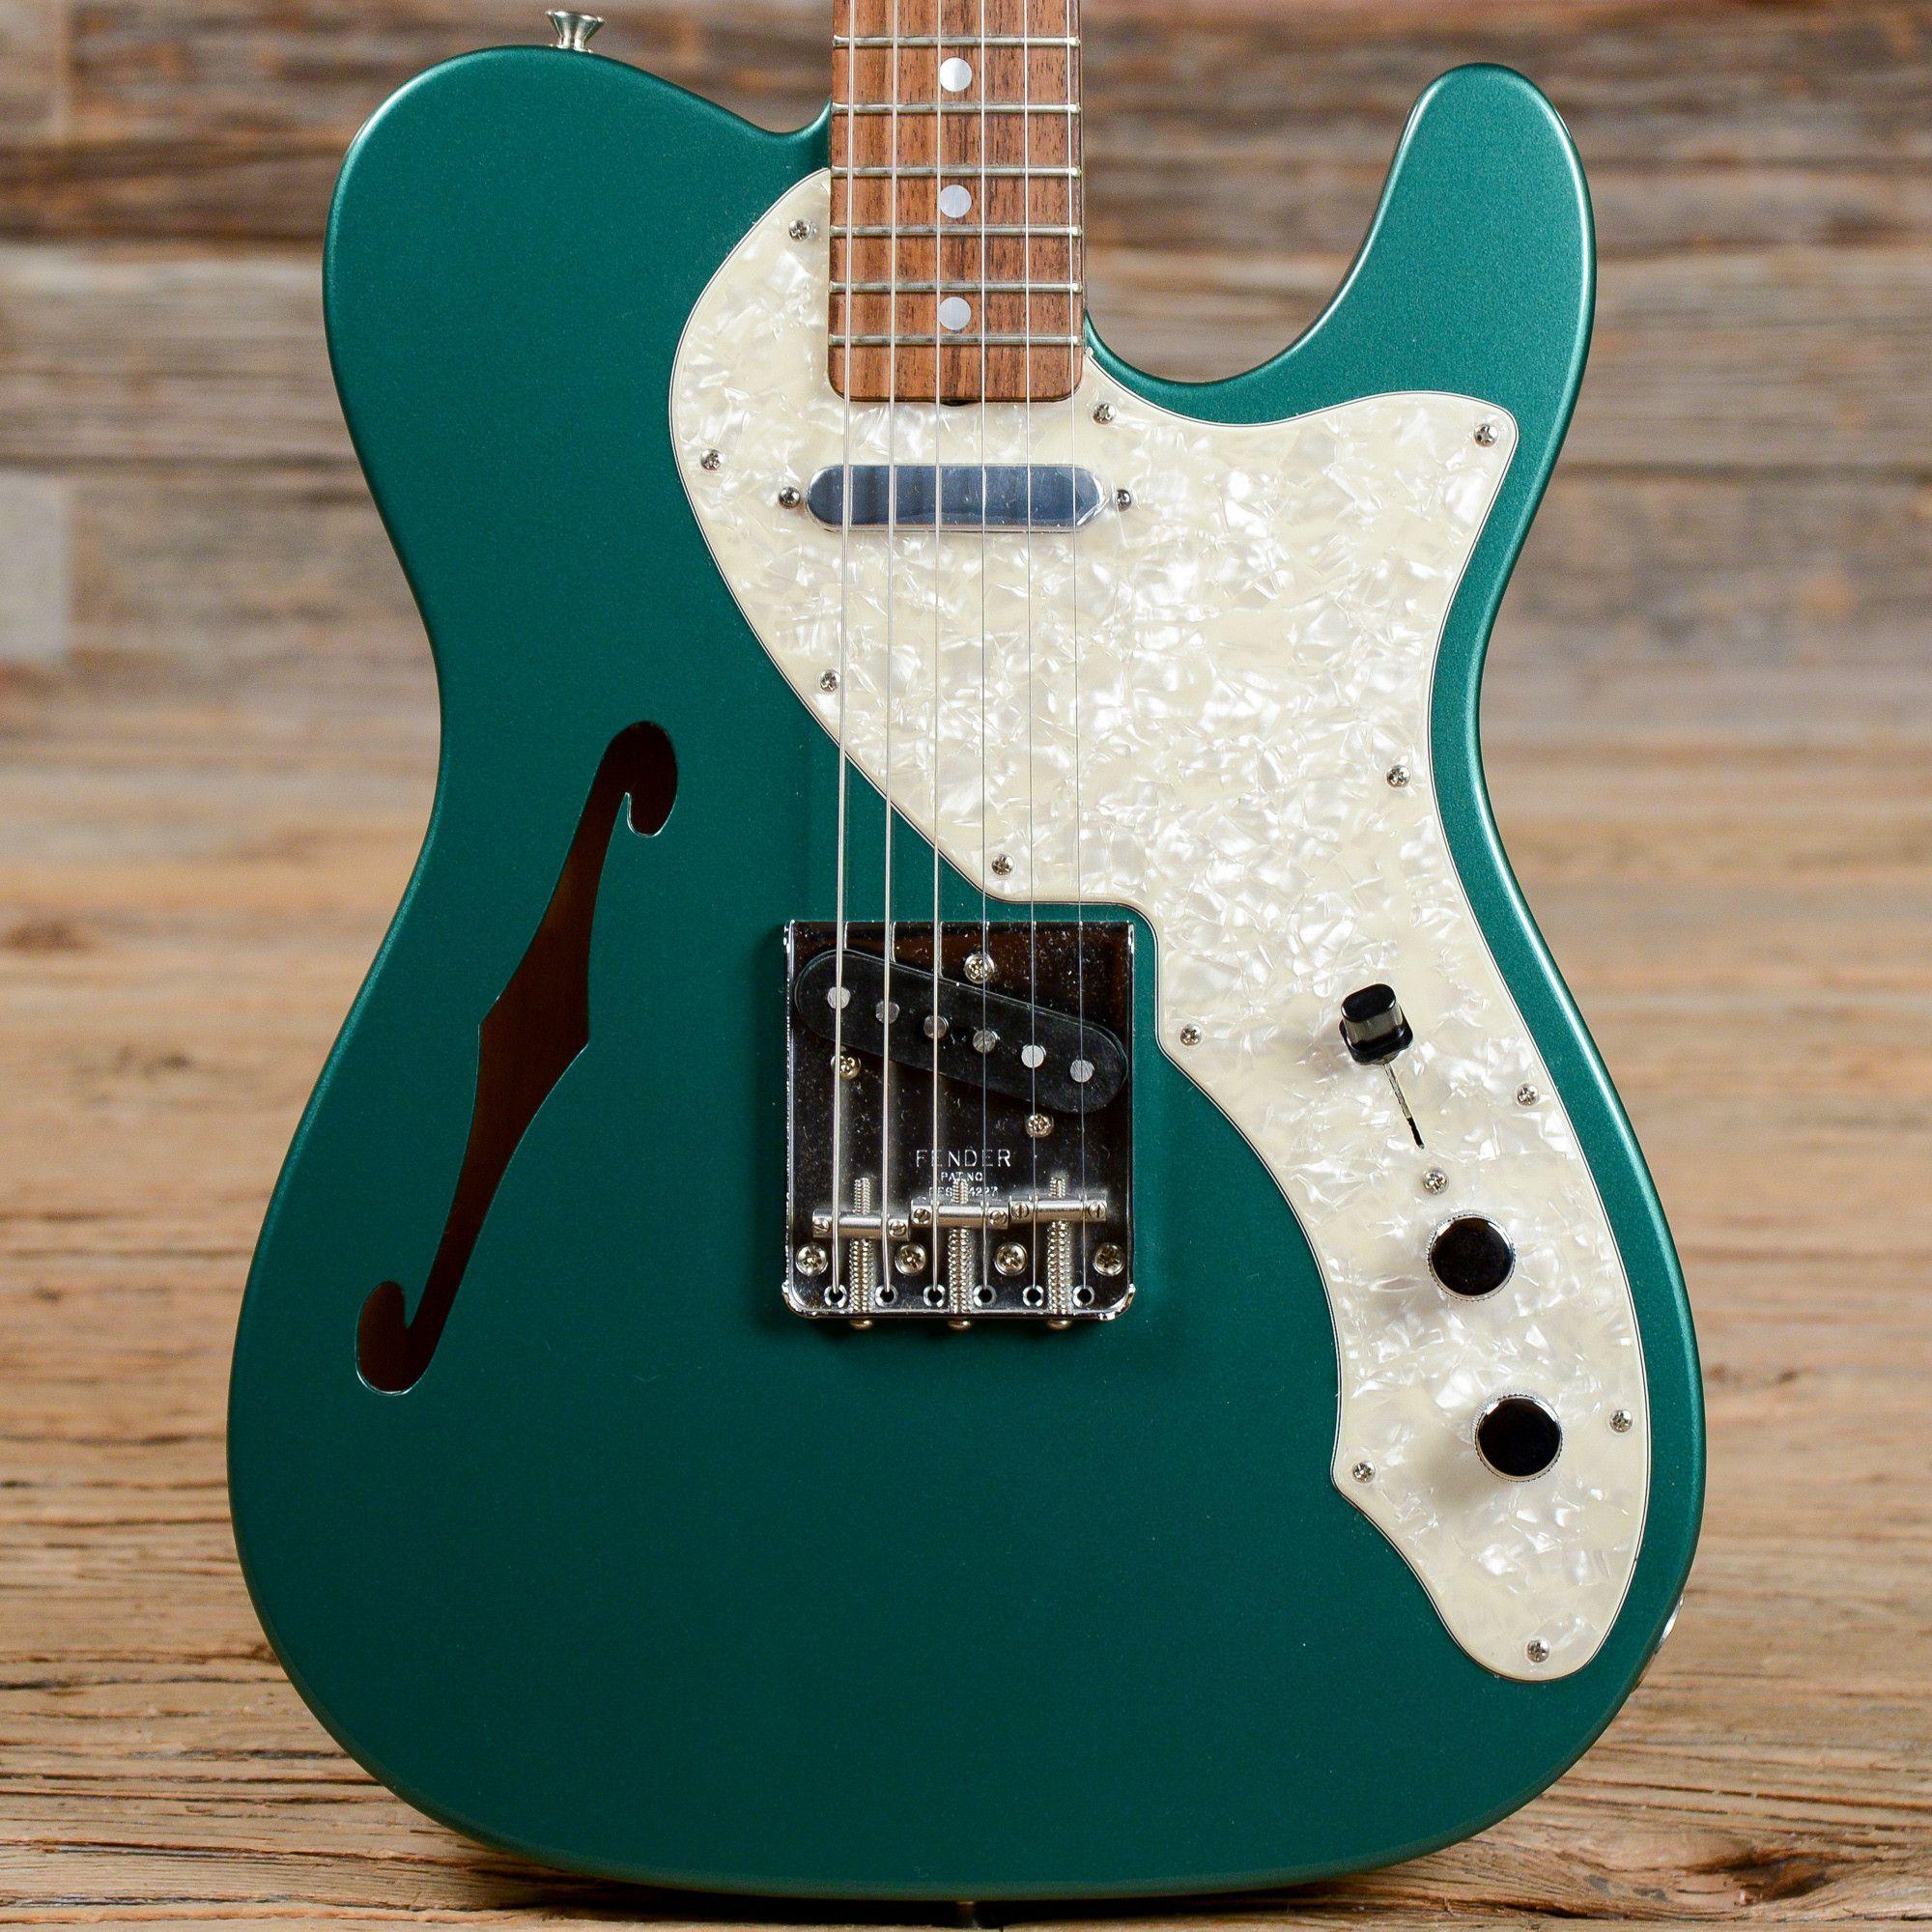 fender custom shop telecaster thinline 69 reissue sherwood green 2012 s806 guitar. Black Bedroom Furniture Sets. Home Design Ideas